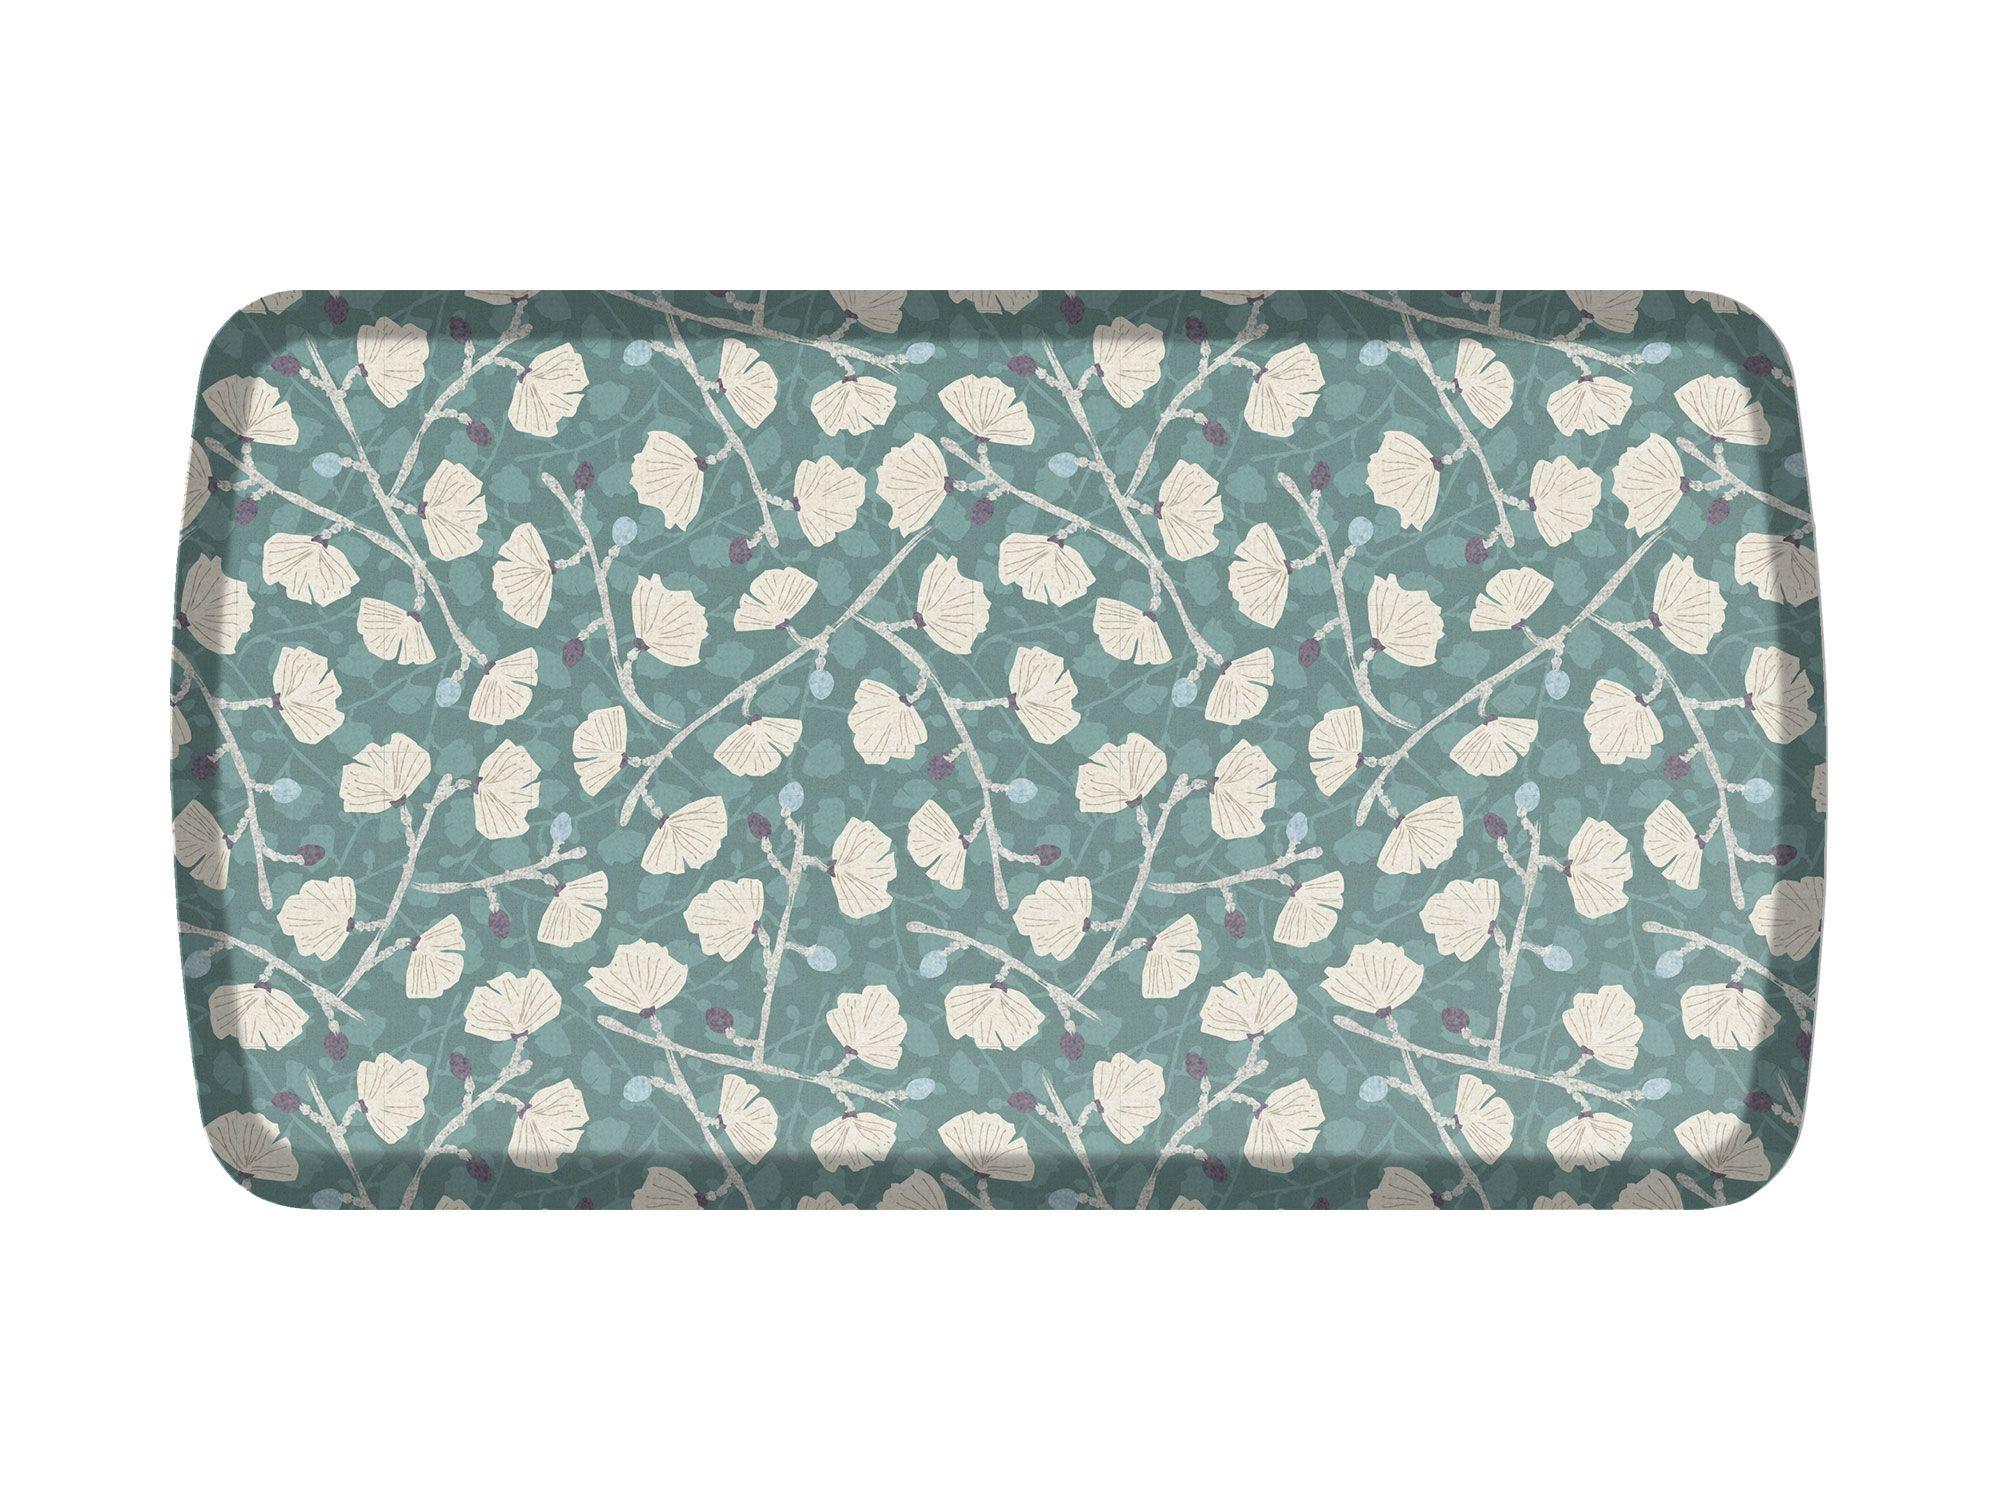 bath with kohls gel kitchen design fatigue costco bathroom ideas antifatigue rug mat comfort at anti floor target area mats k rugs